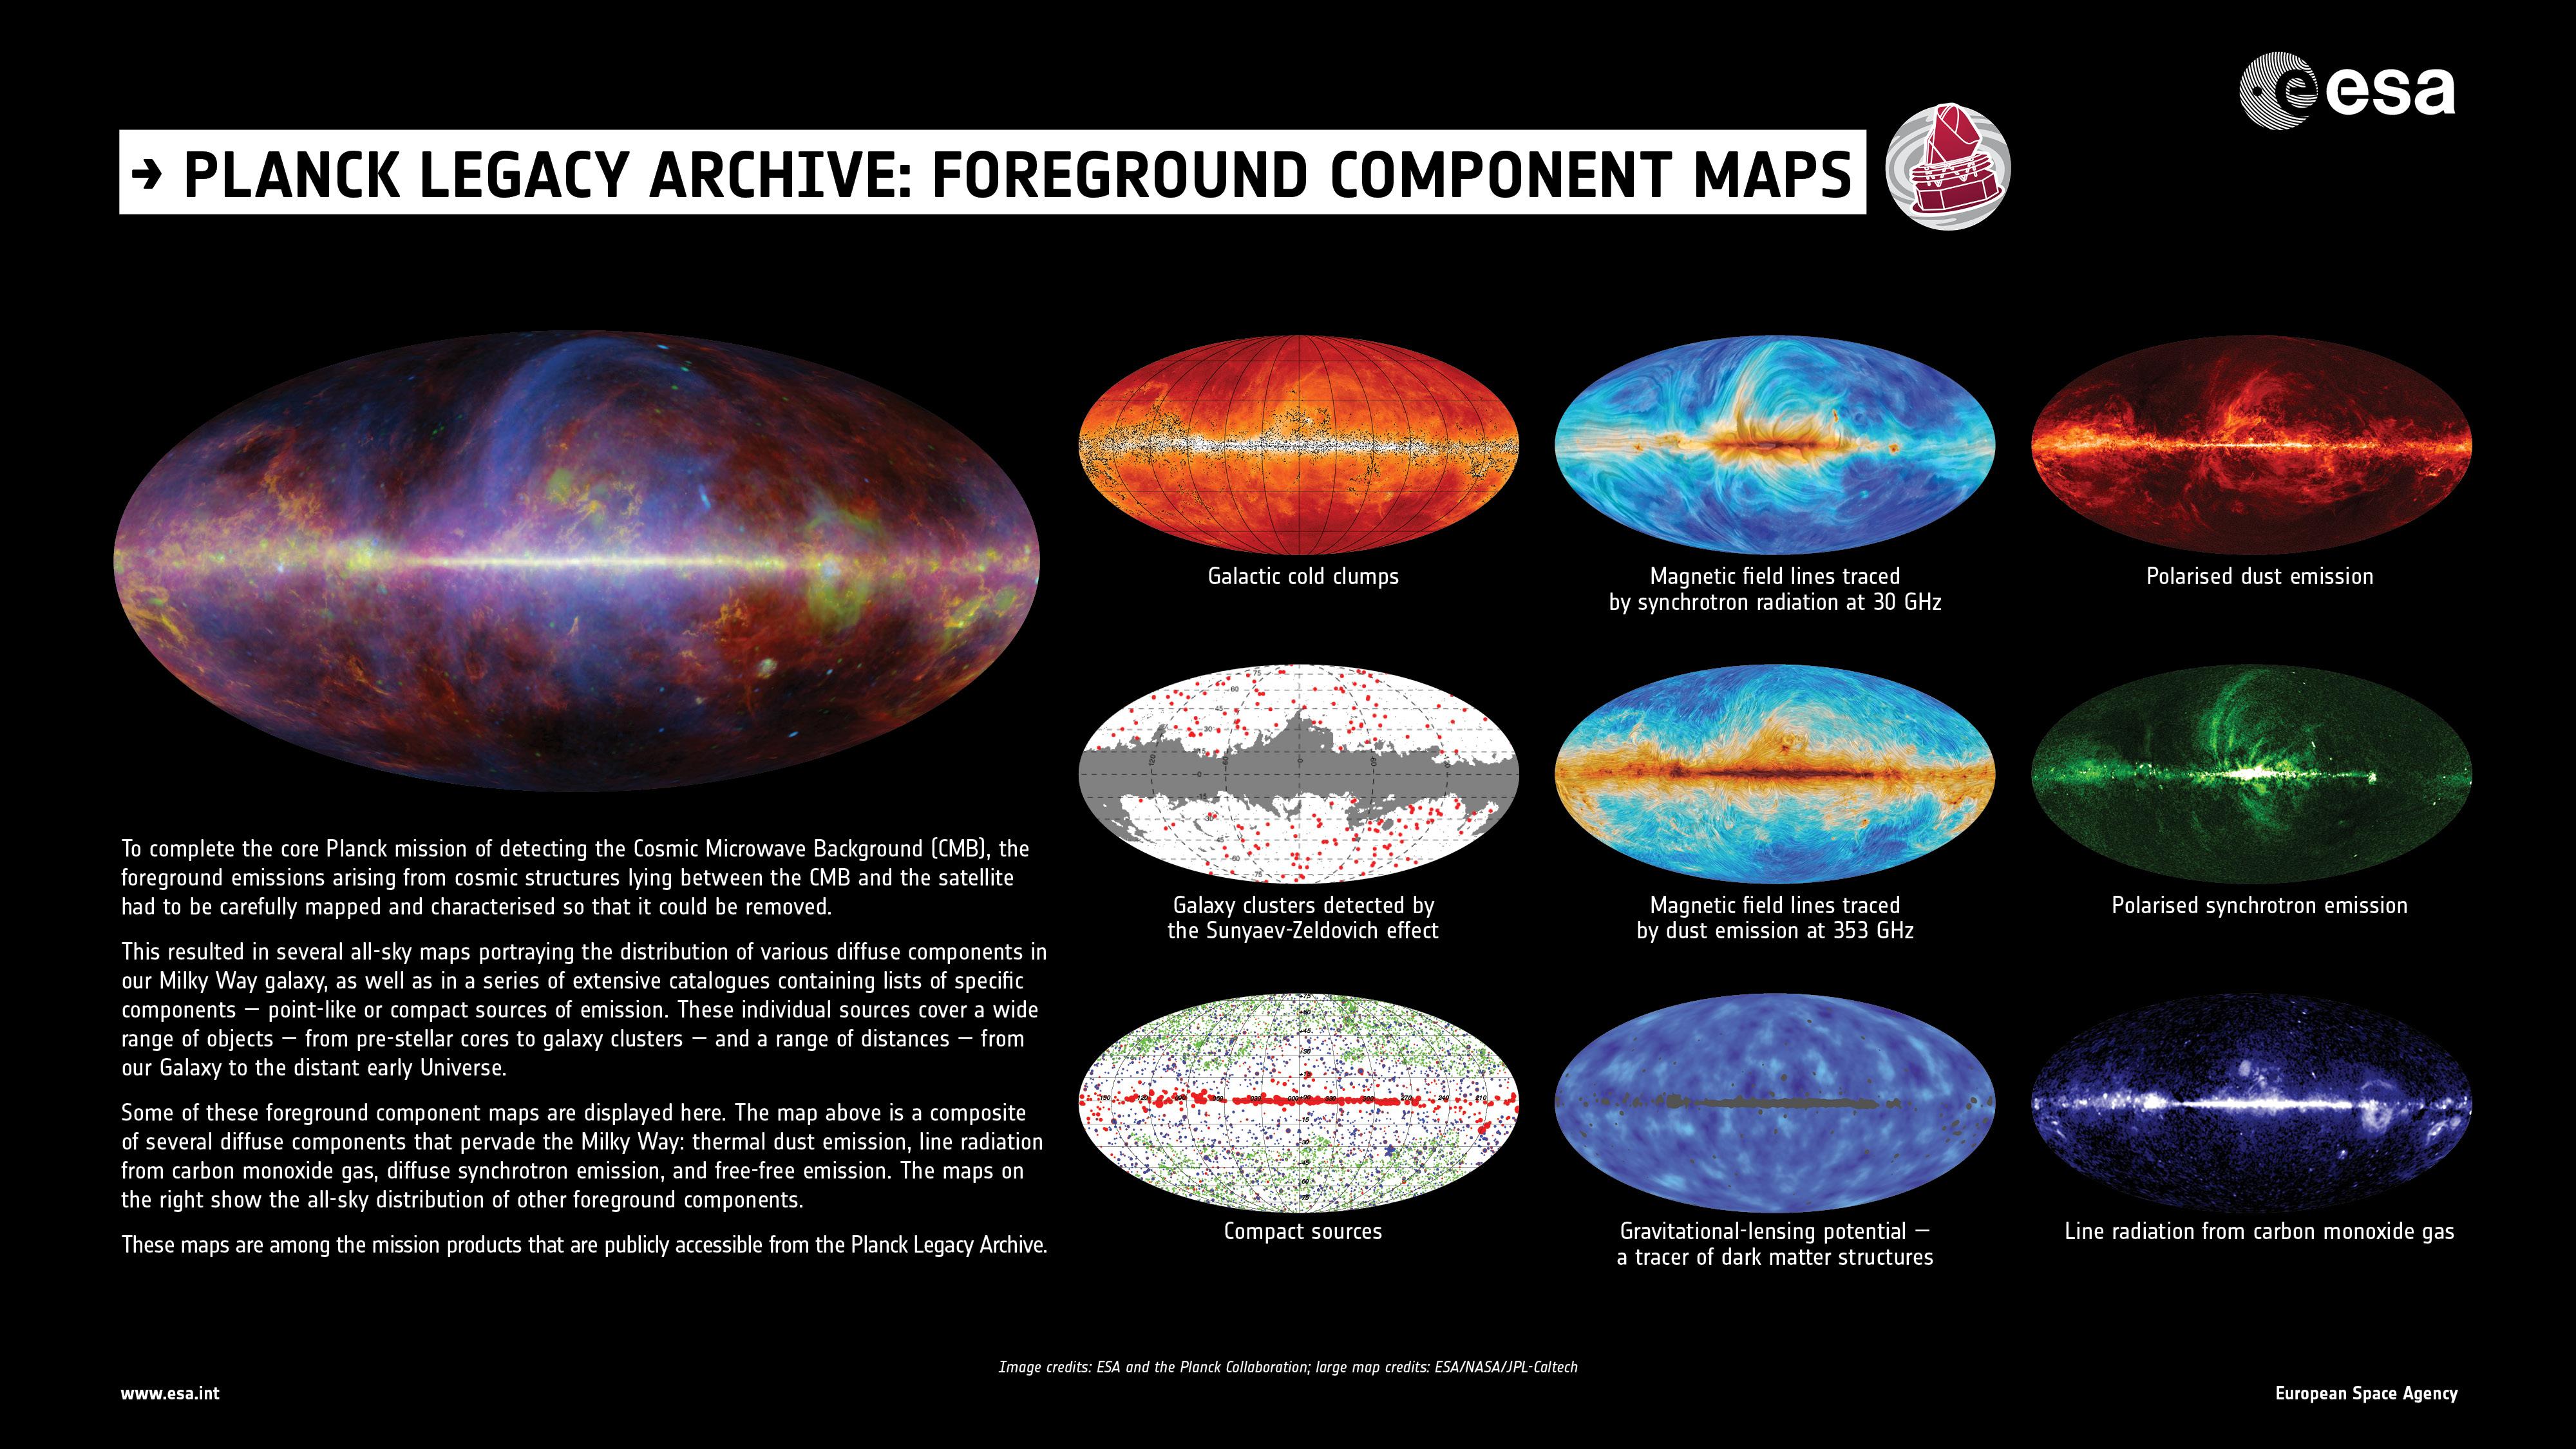 1567215877318-Planck_LegacyArchive_ForegroundComponentMaps.jpg